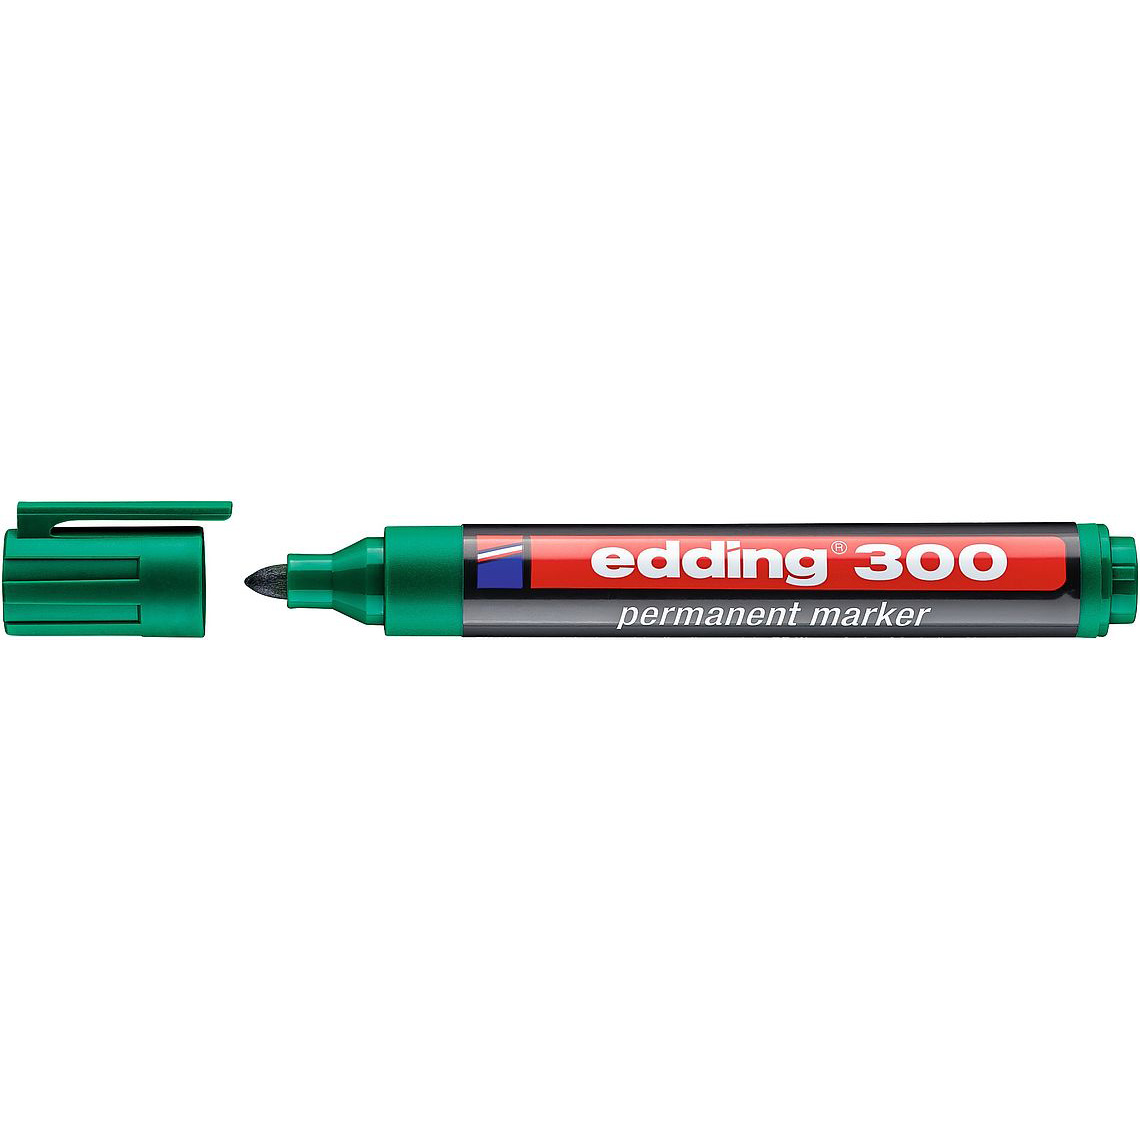 Edding 300 Permanent Marker Bullet Tip - Green (pc)